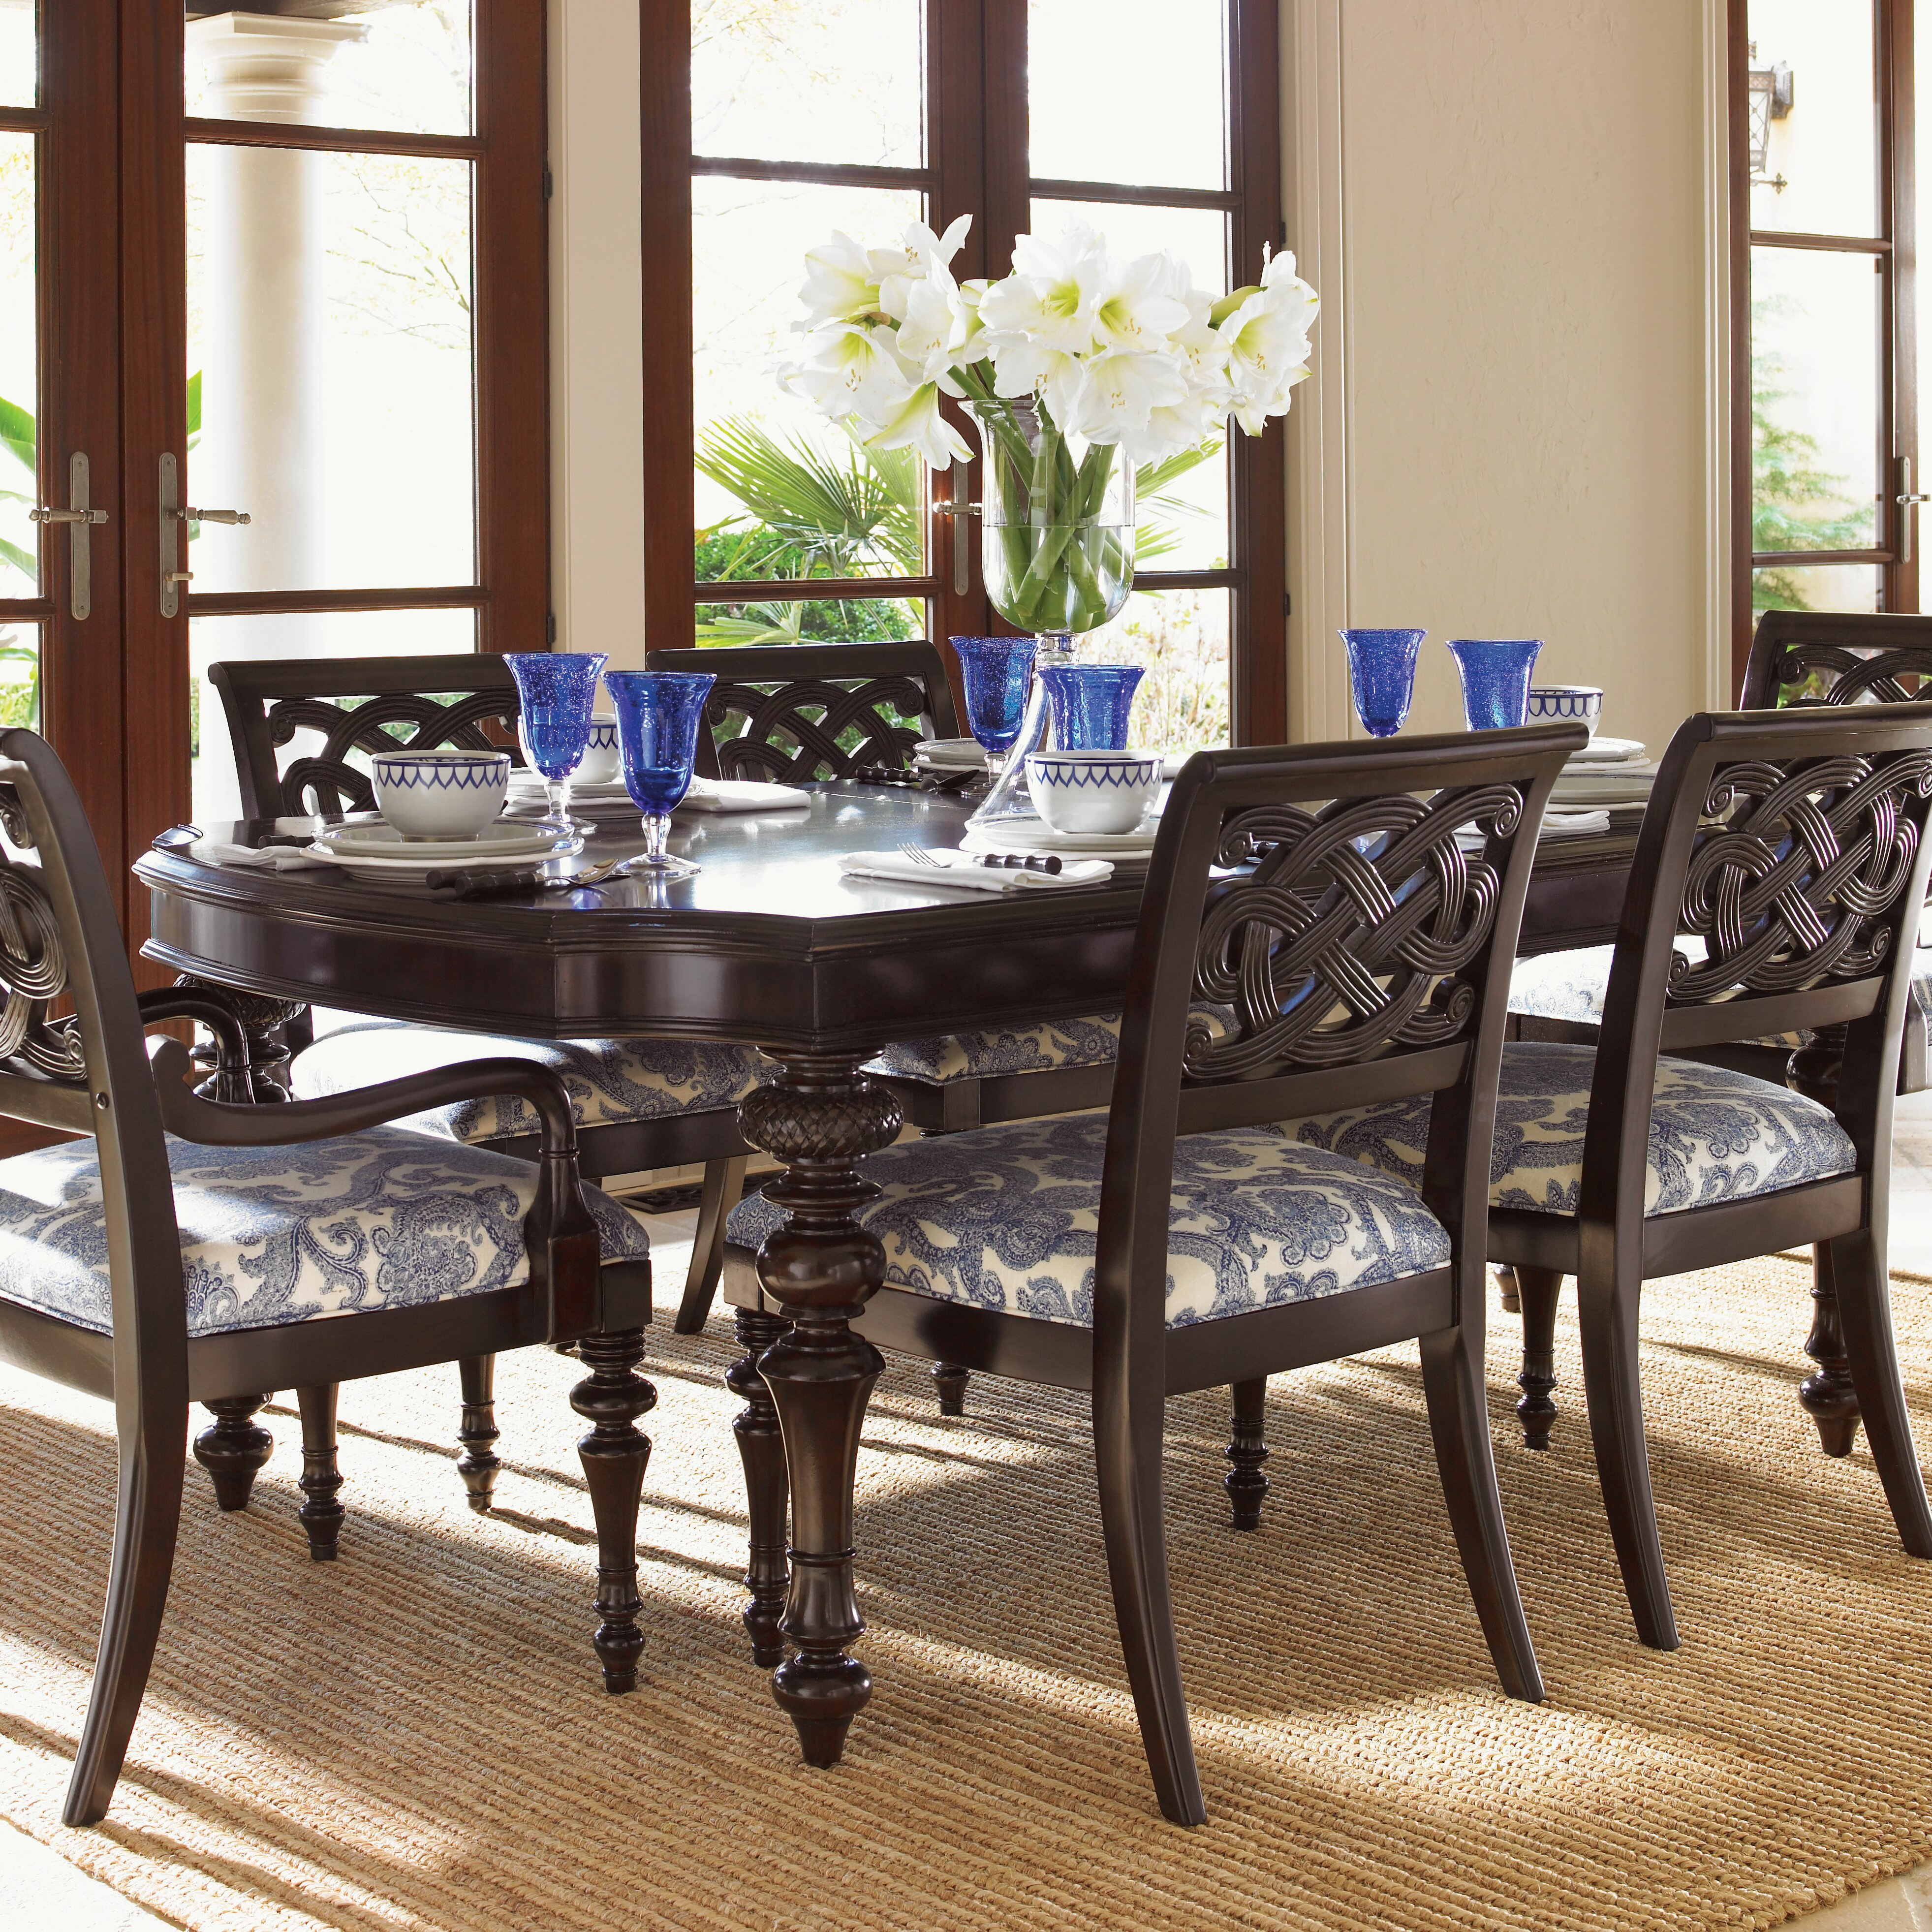 Tommy bahama home royal kahala 7 piece dining set